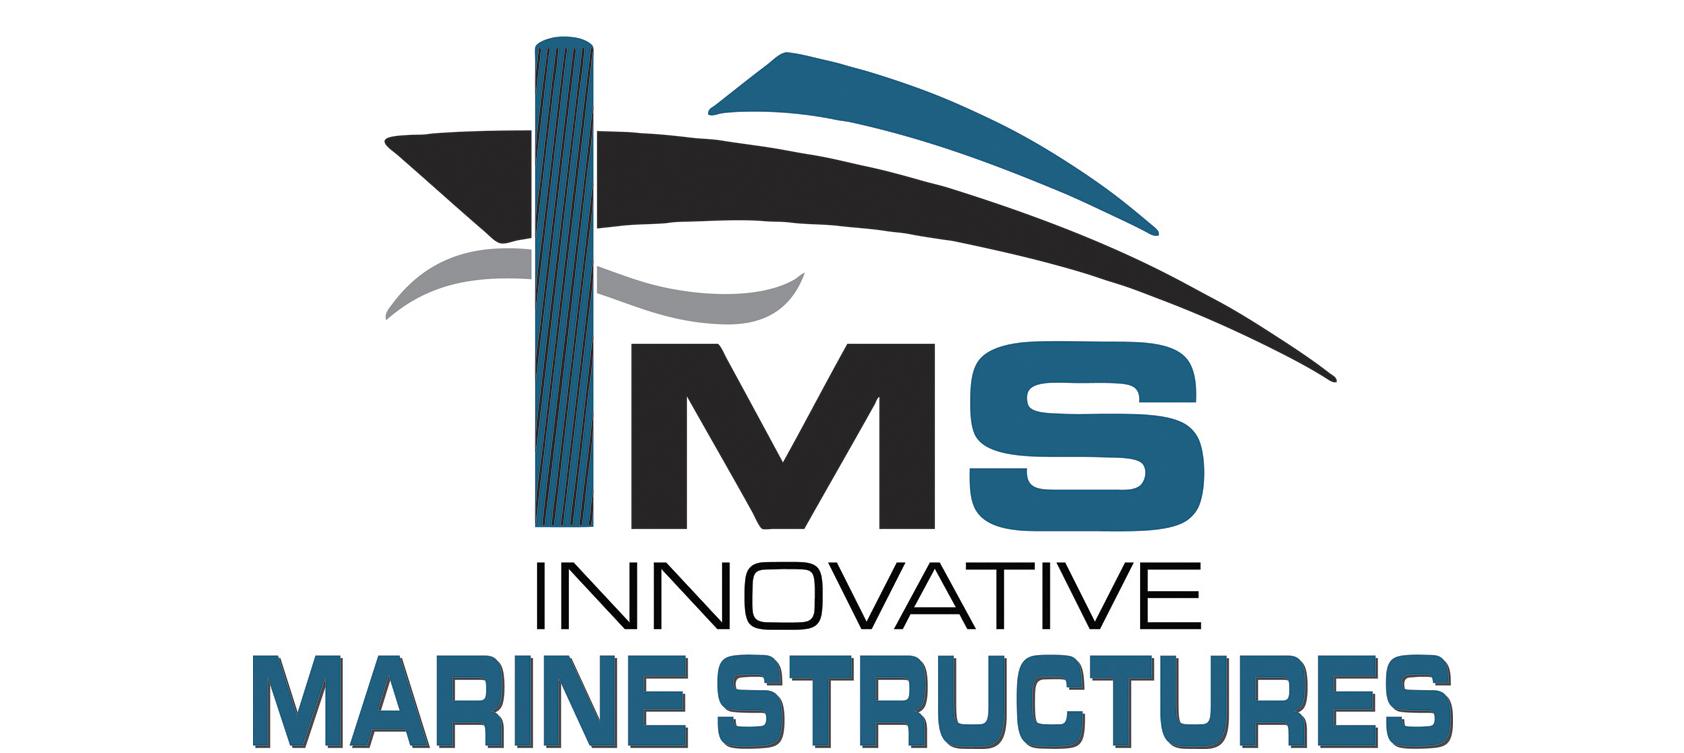 Innovative Marine Structures - Boat Lifts, Docks, Seawalls & More image 0